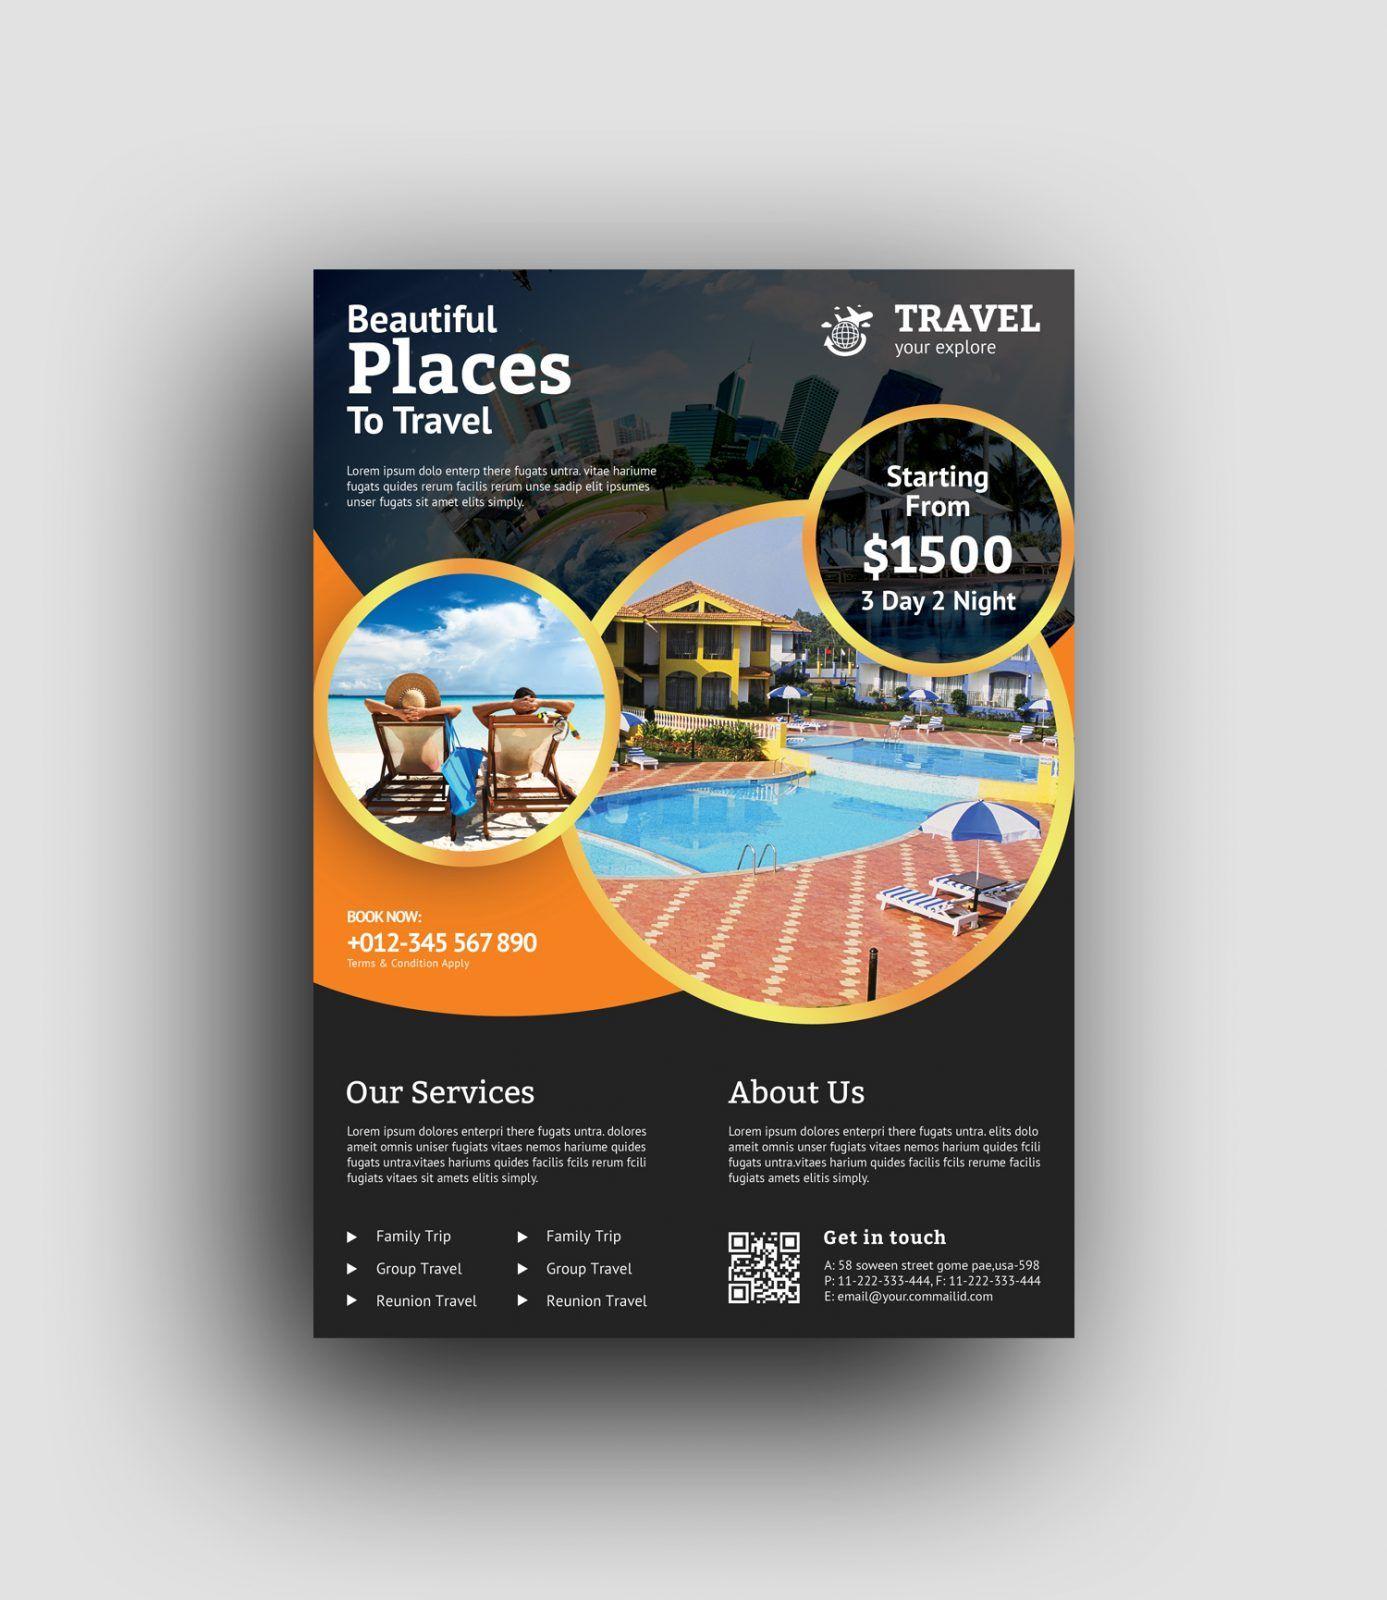 Tourism Events Calendar Flyer Template: Premium Travel Agency Flyer Design Template 001480